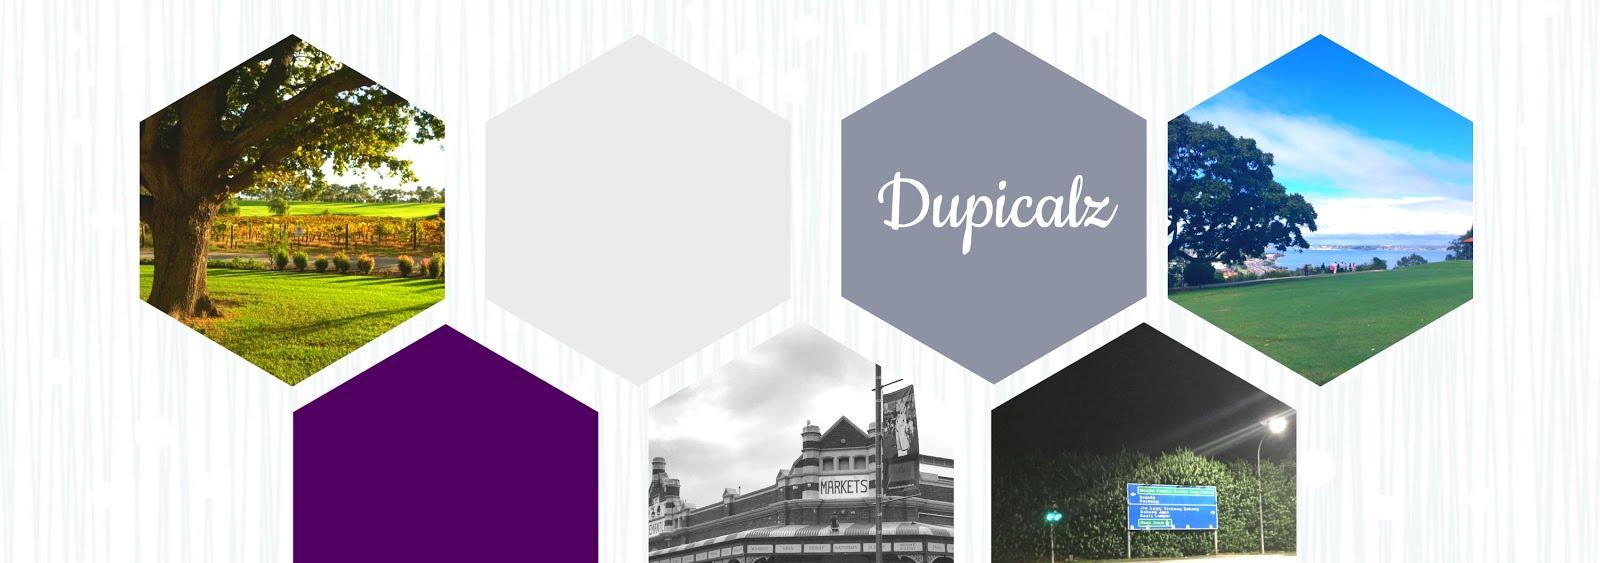 Dupicalz